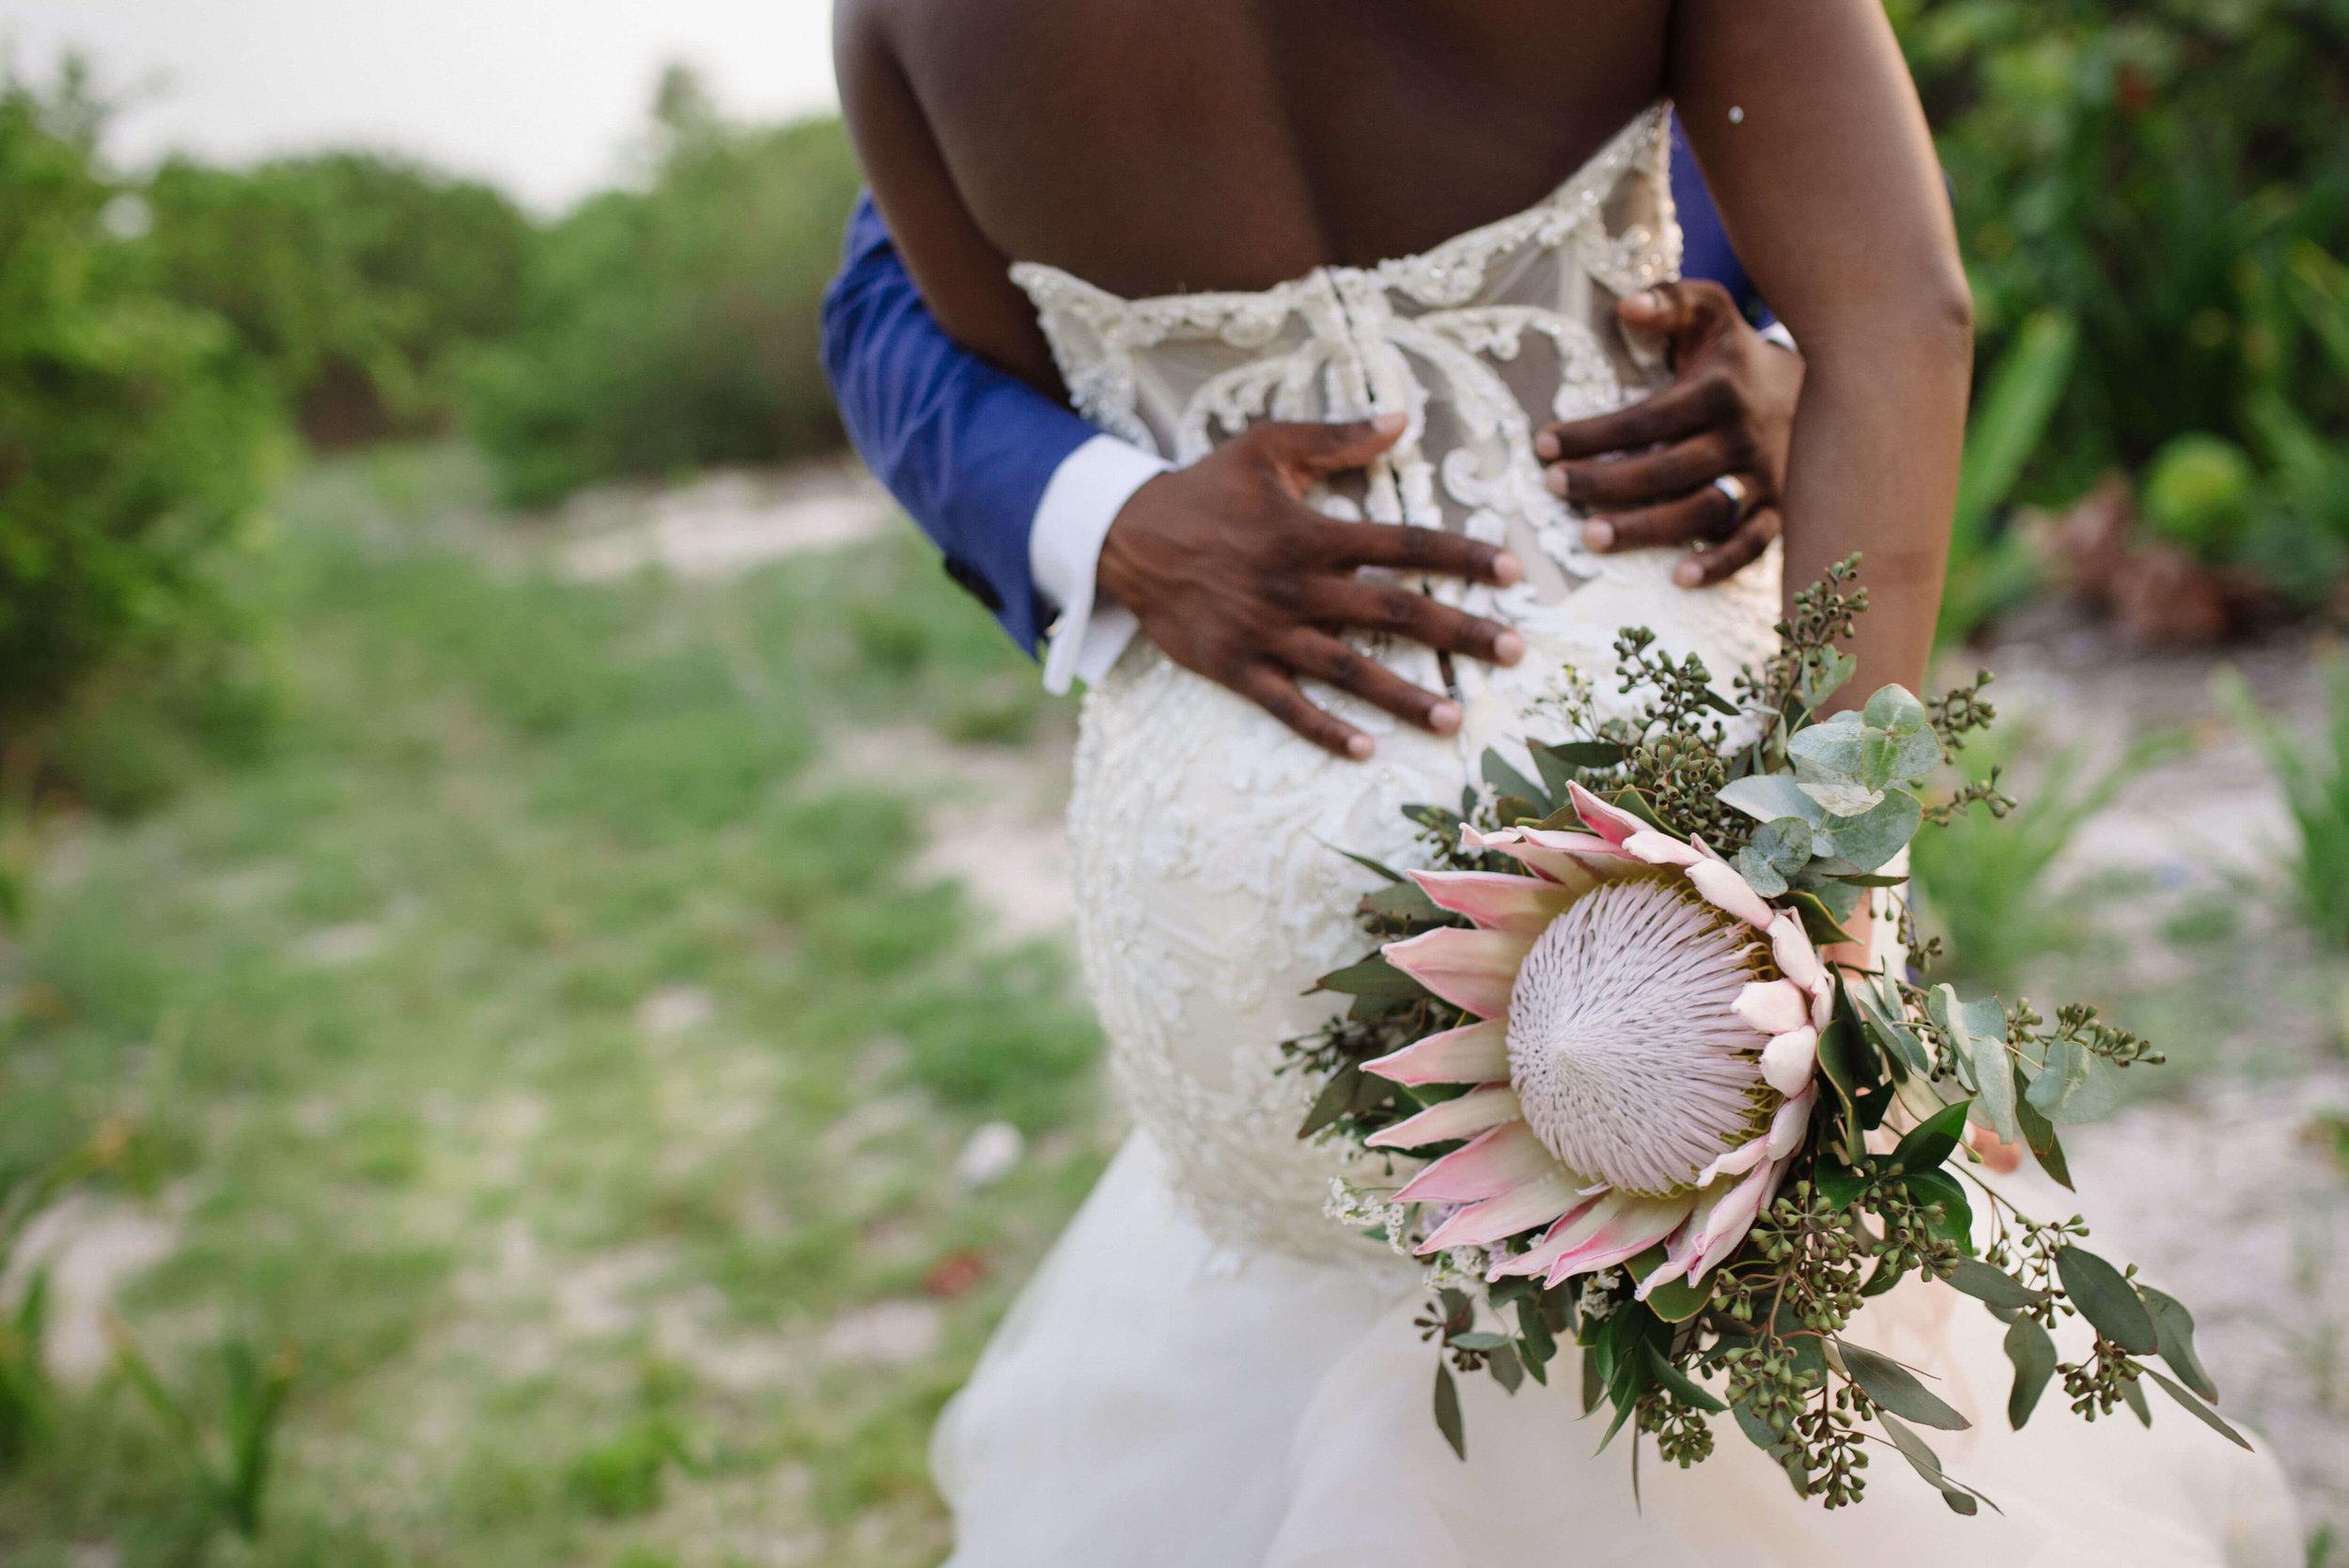 destiland-desti-sweating-for-the-destination-wedding-ready-workouts-2019-booty-3.jpg